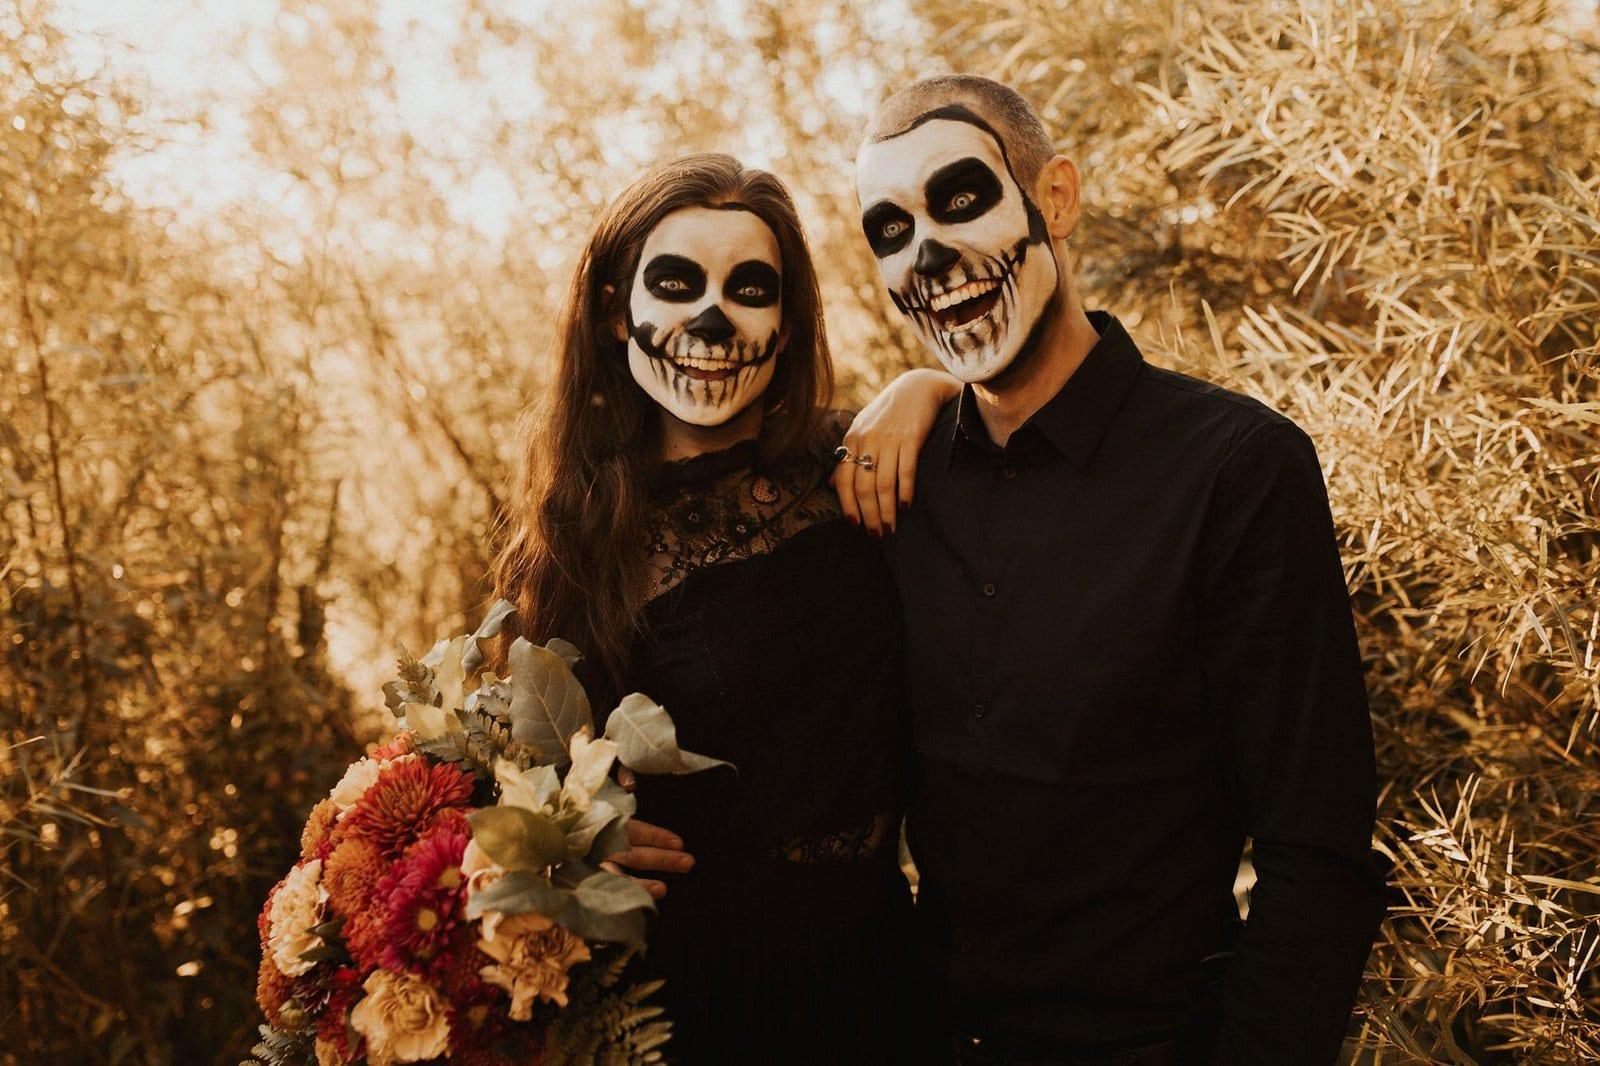 Smiling skeleton faces for Halloween.